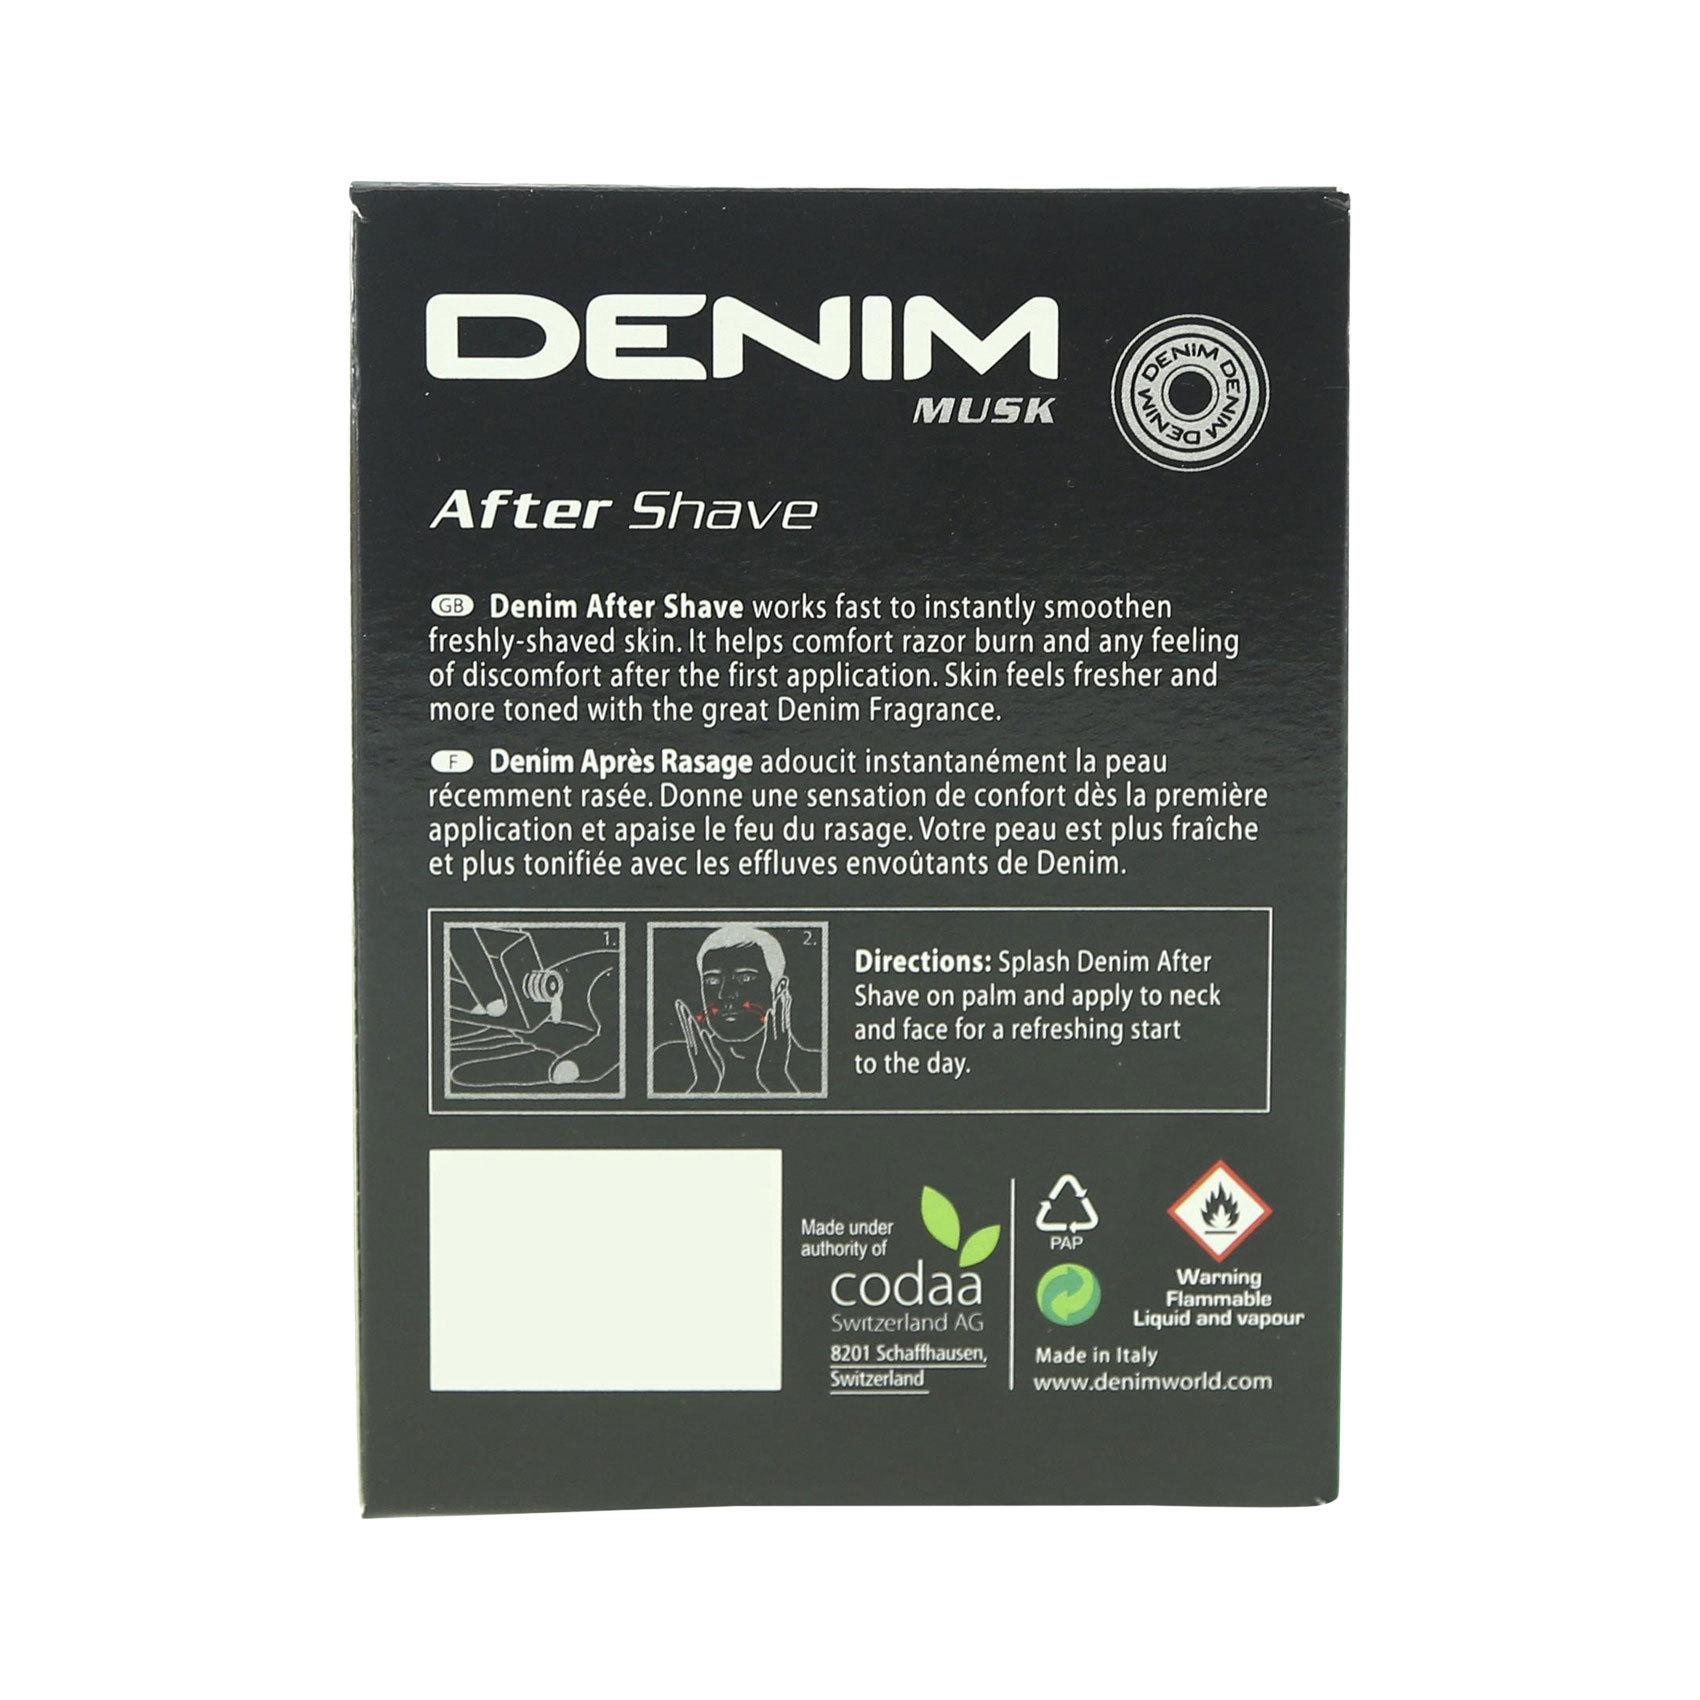 DENIM A/SHAVE MUSK 100ML